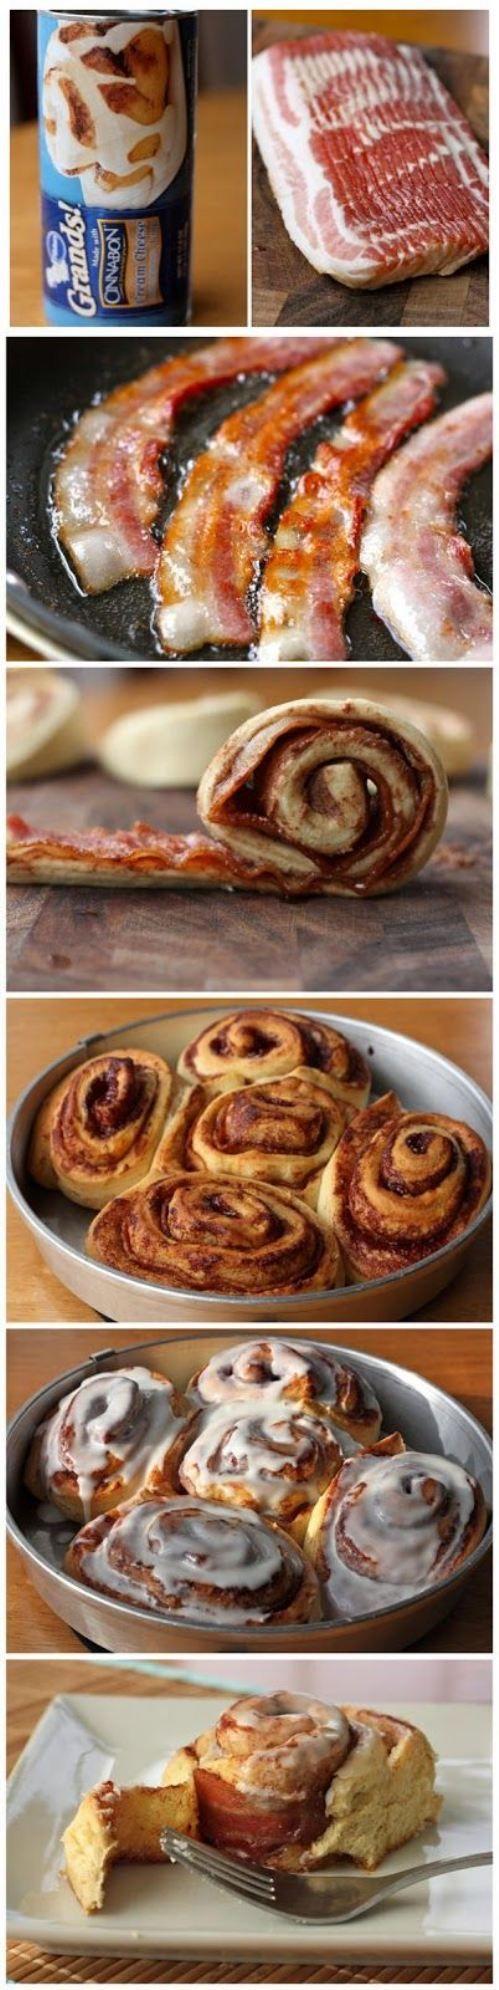 Bacon cinnamon rolls